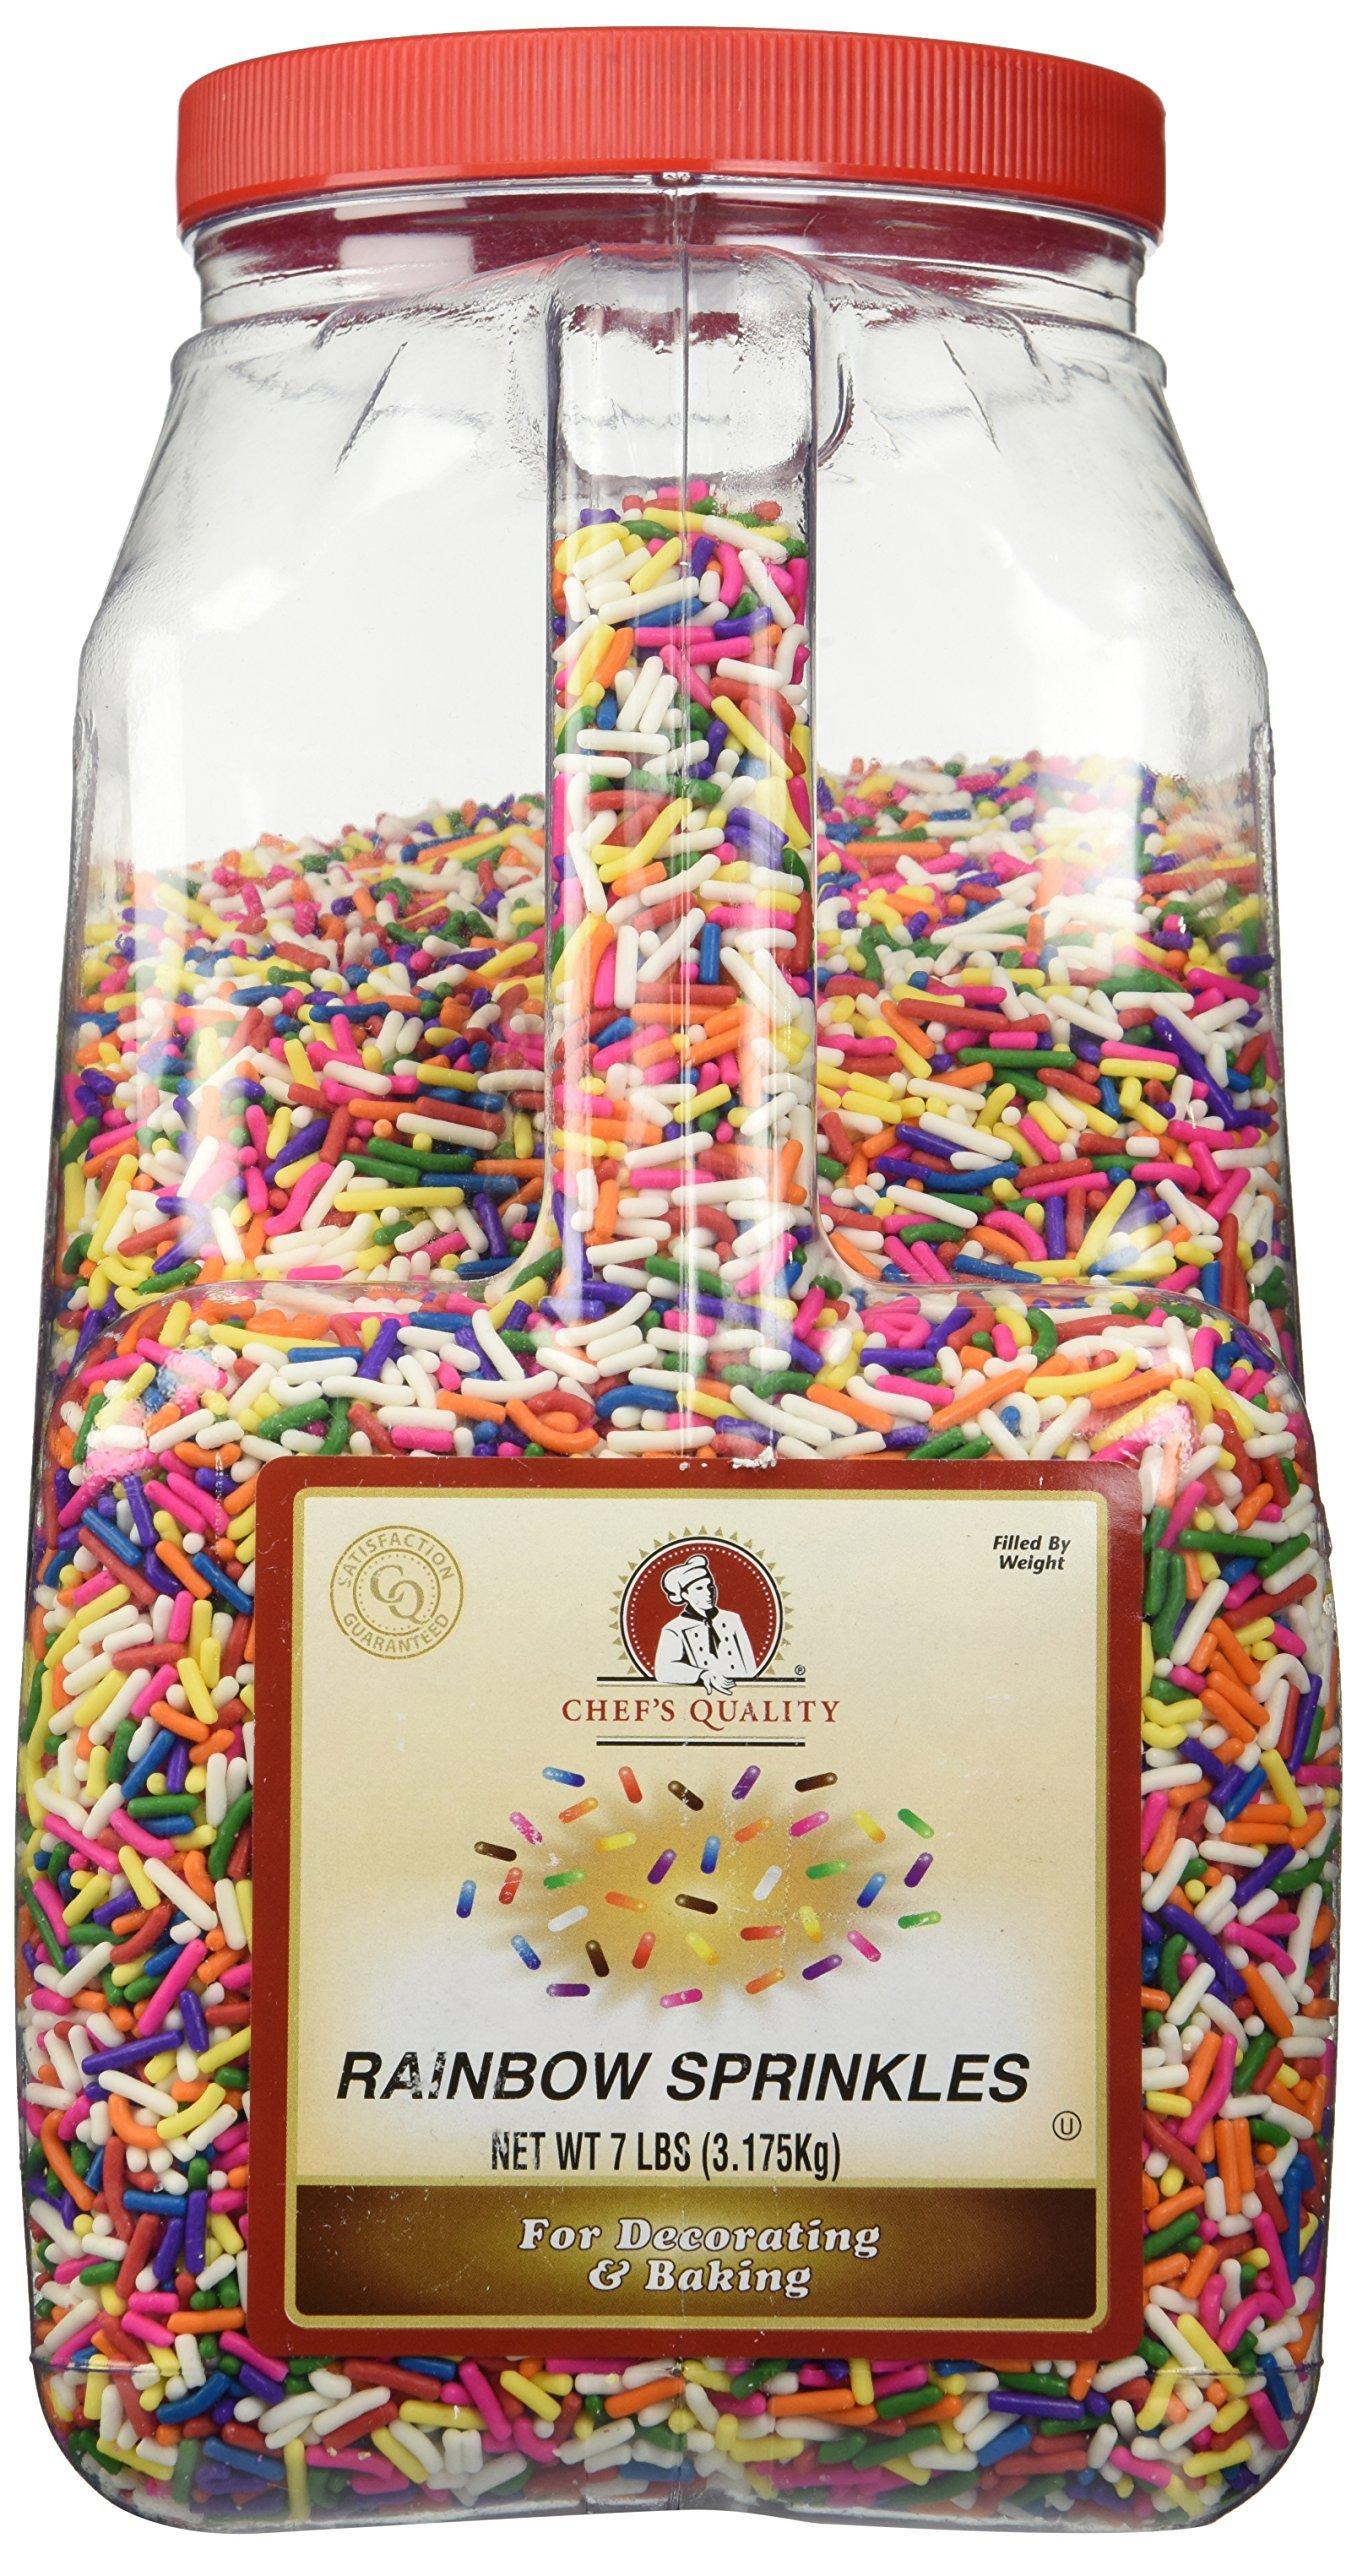 Chef's Quality Rainbow Sprinkles, 7 lb